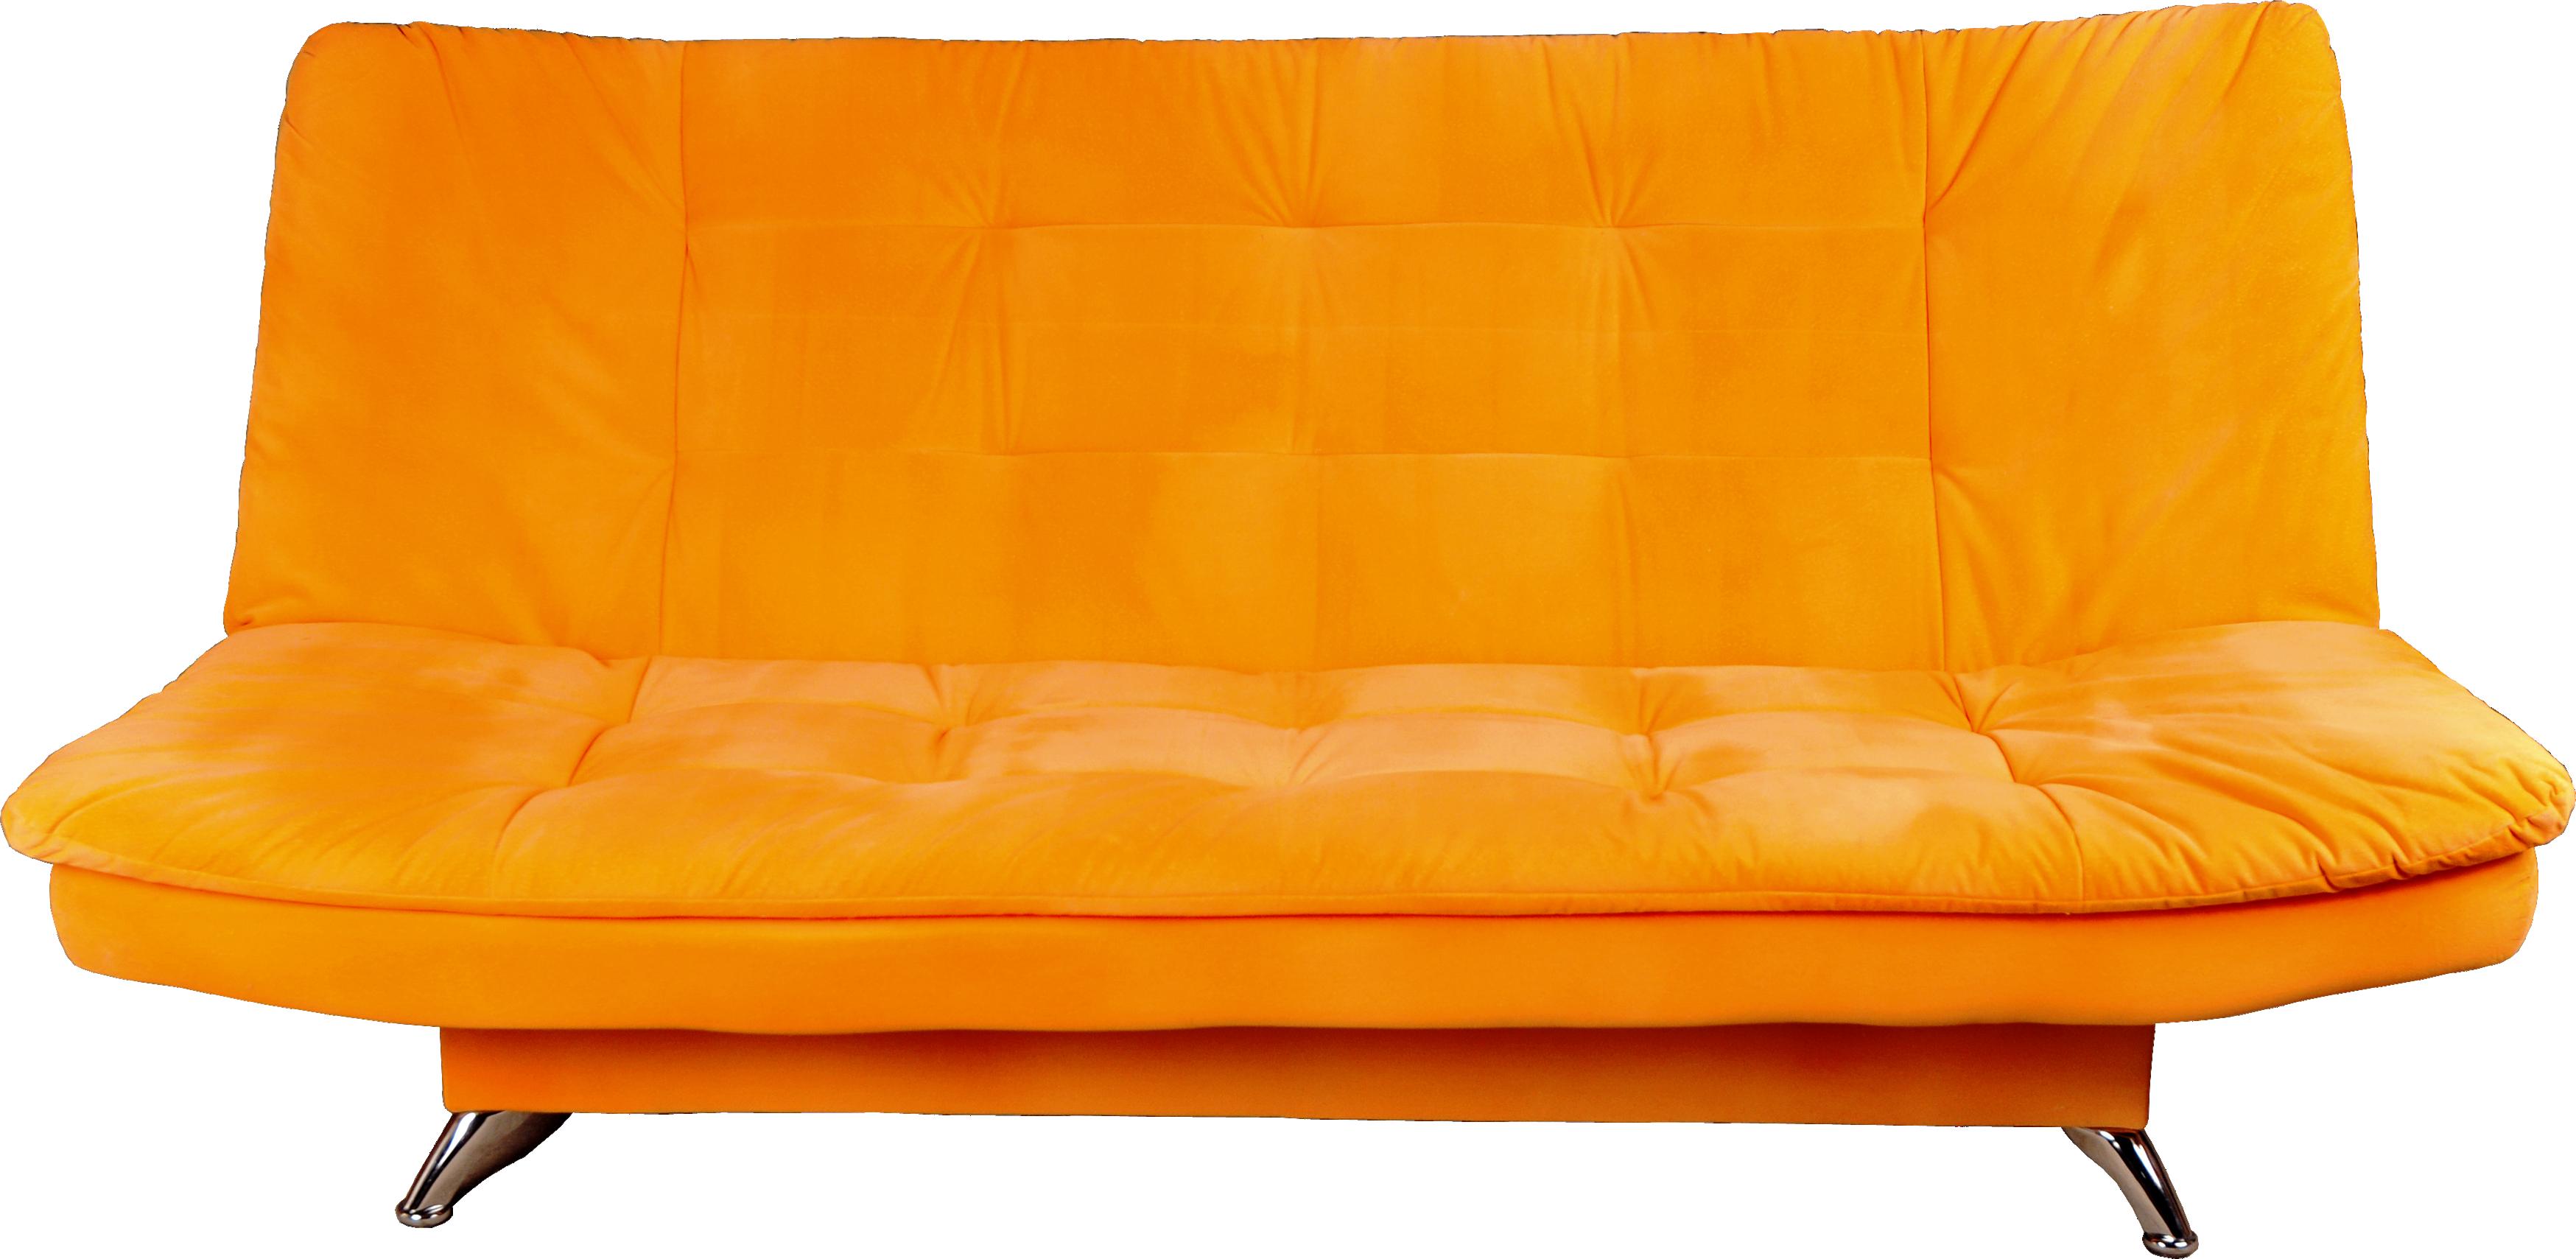 Local made sofa set tissus finish relaxon group - Orange Sofa Png Image